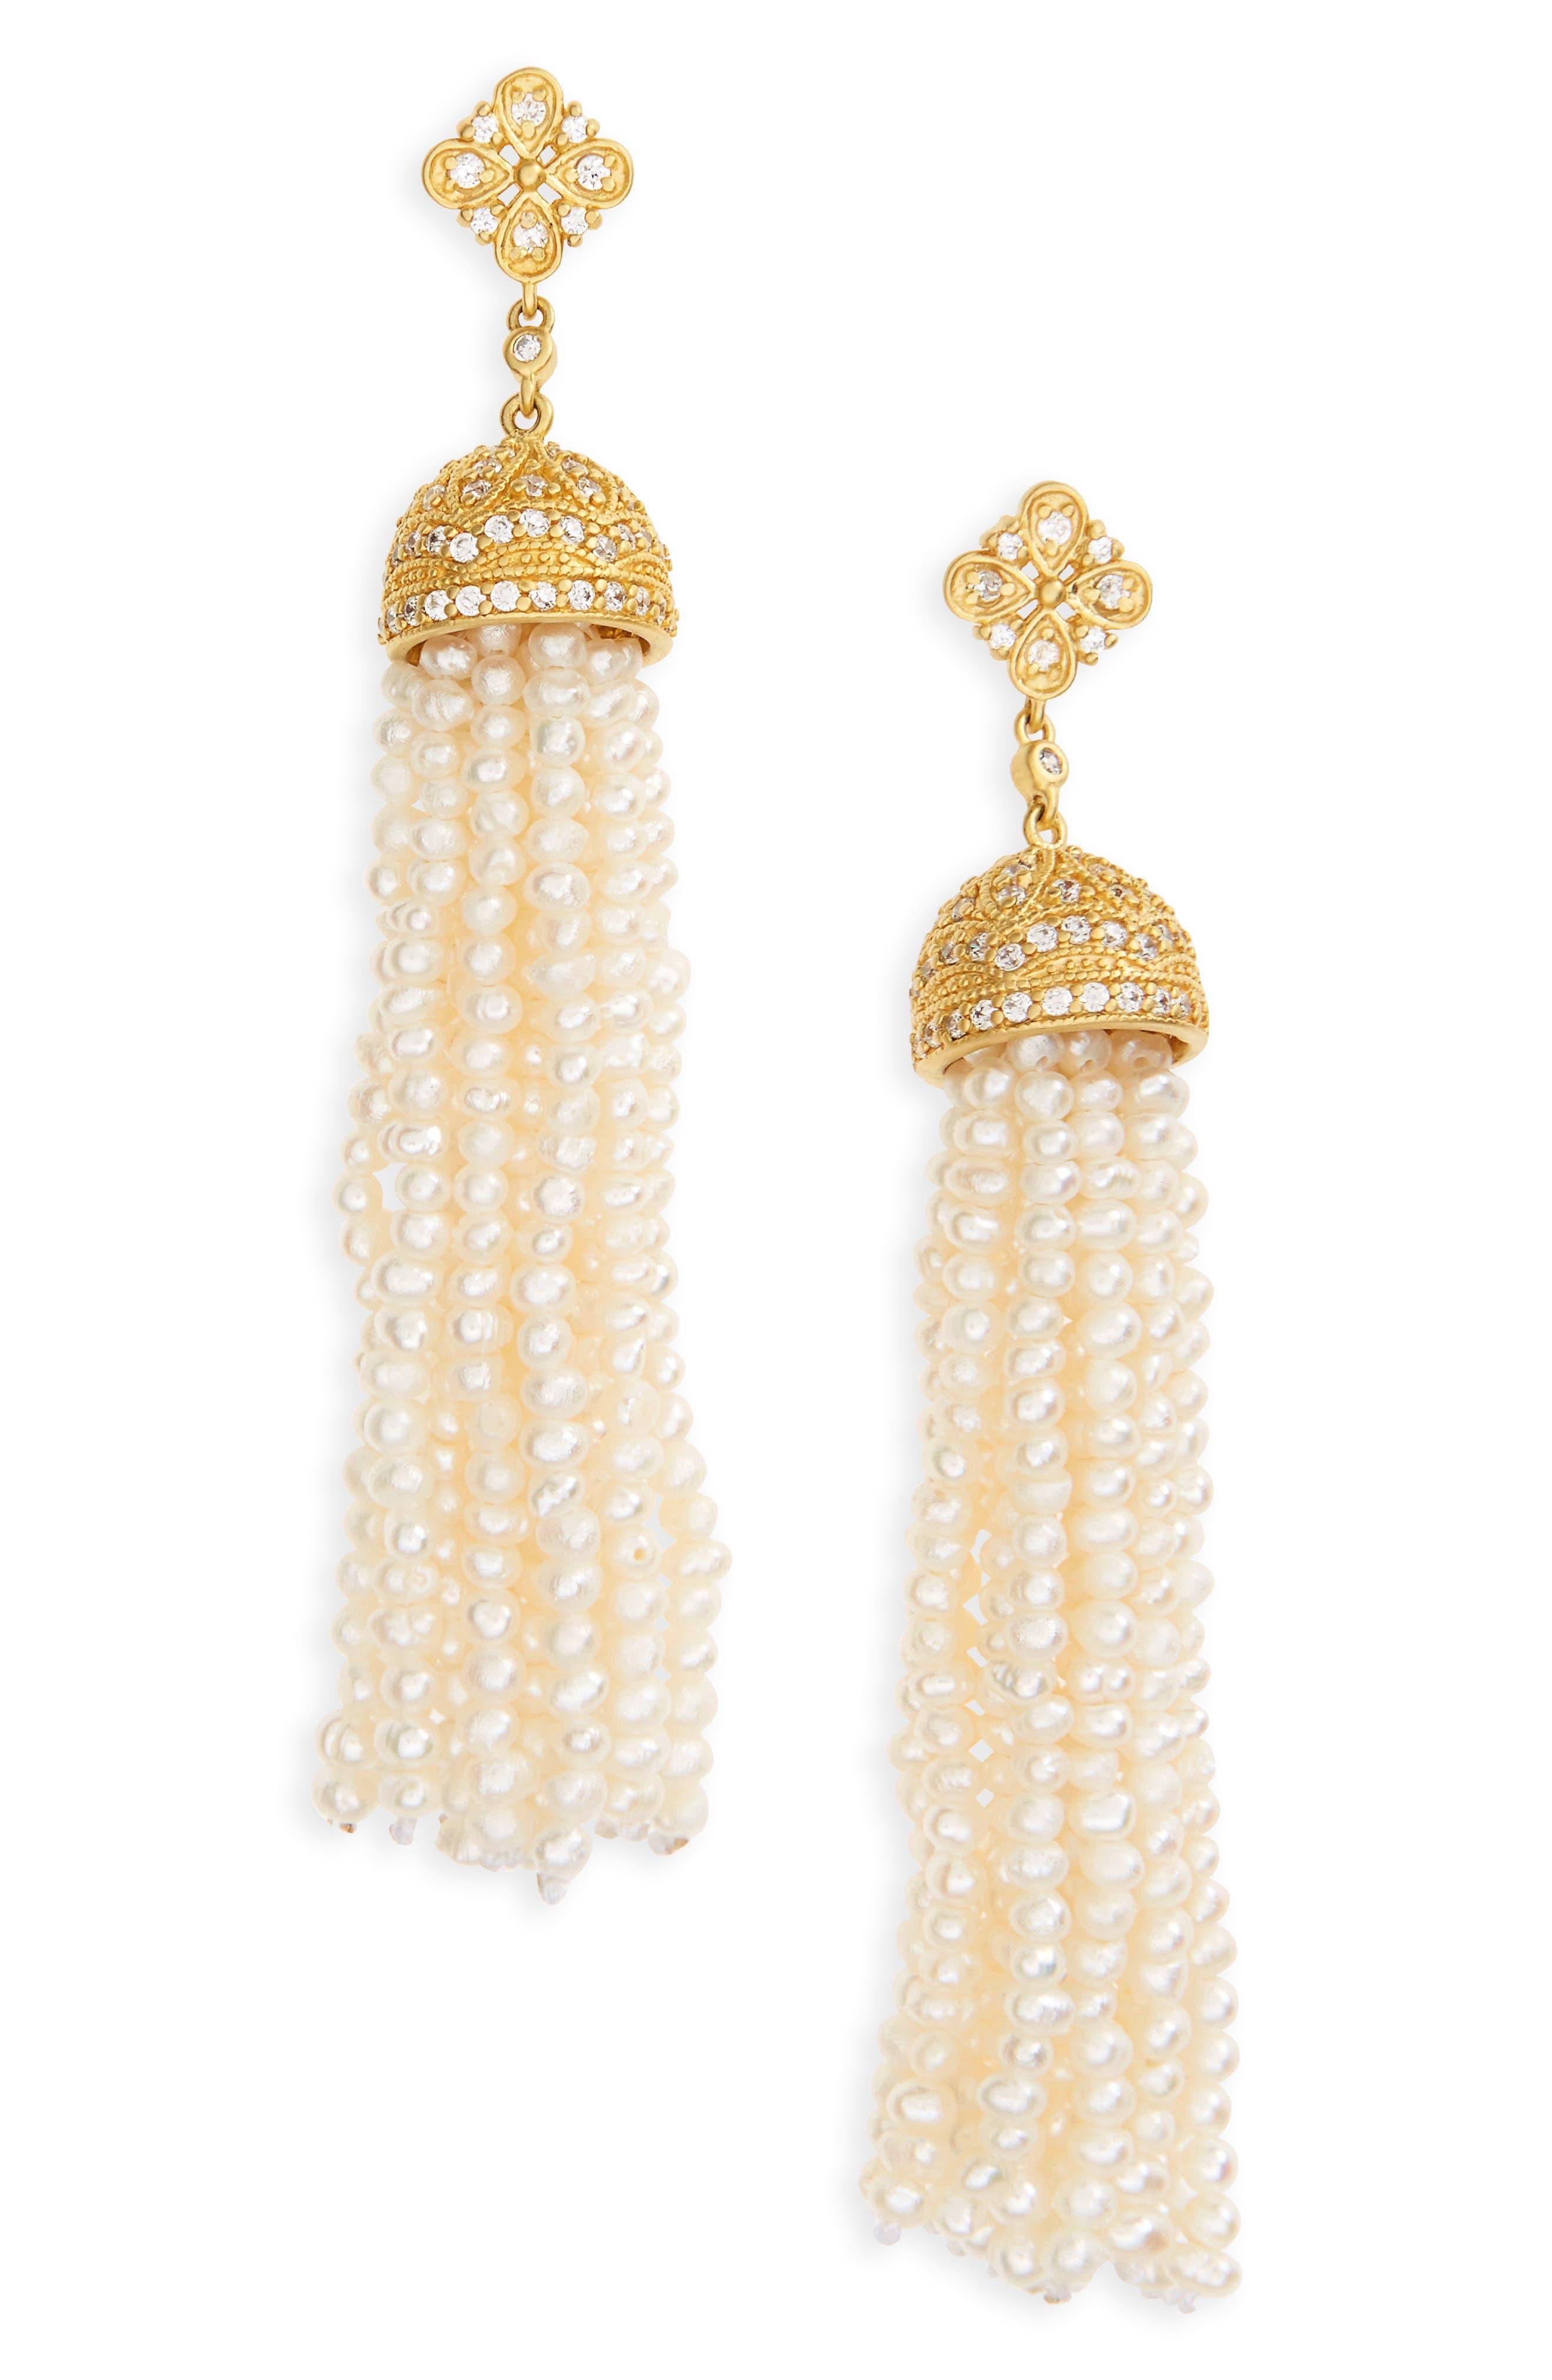 Main Image - FREIDA ROTHMAN Audrey Waterfall Tassel Pearl Earrings